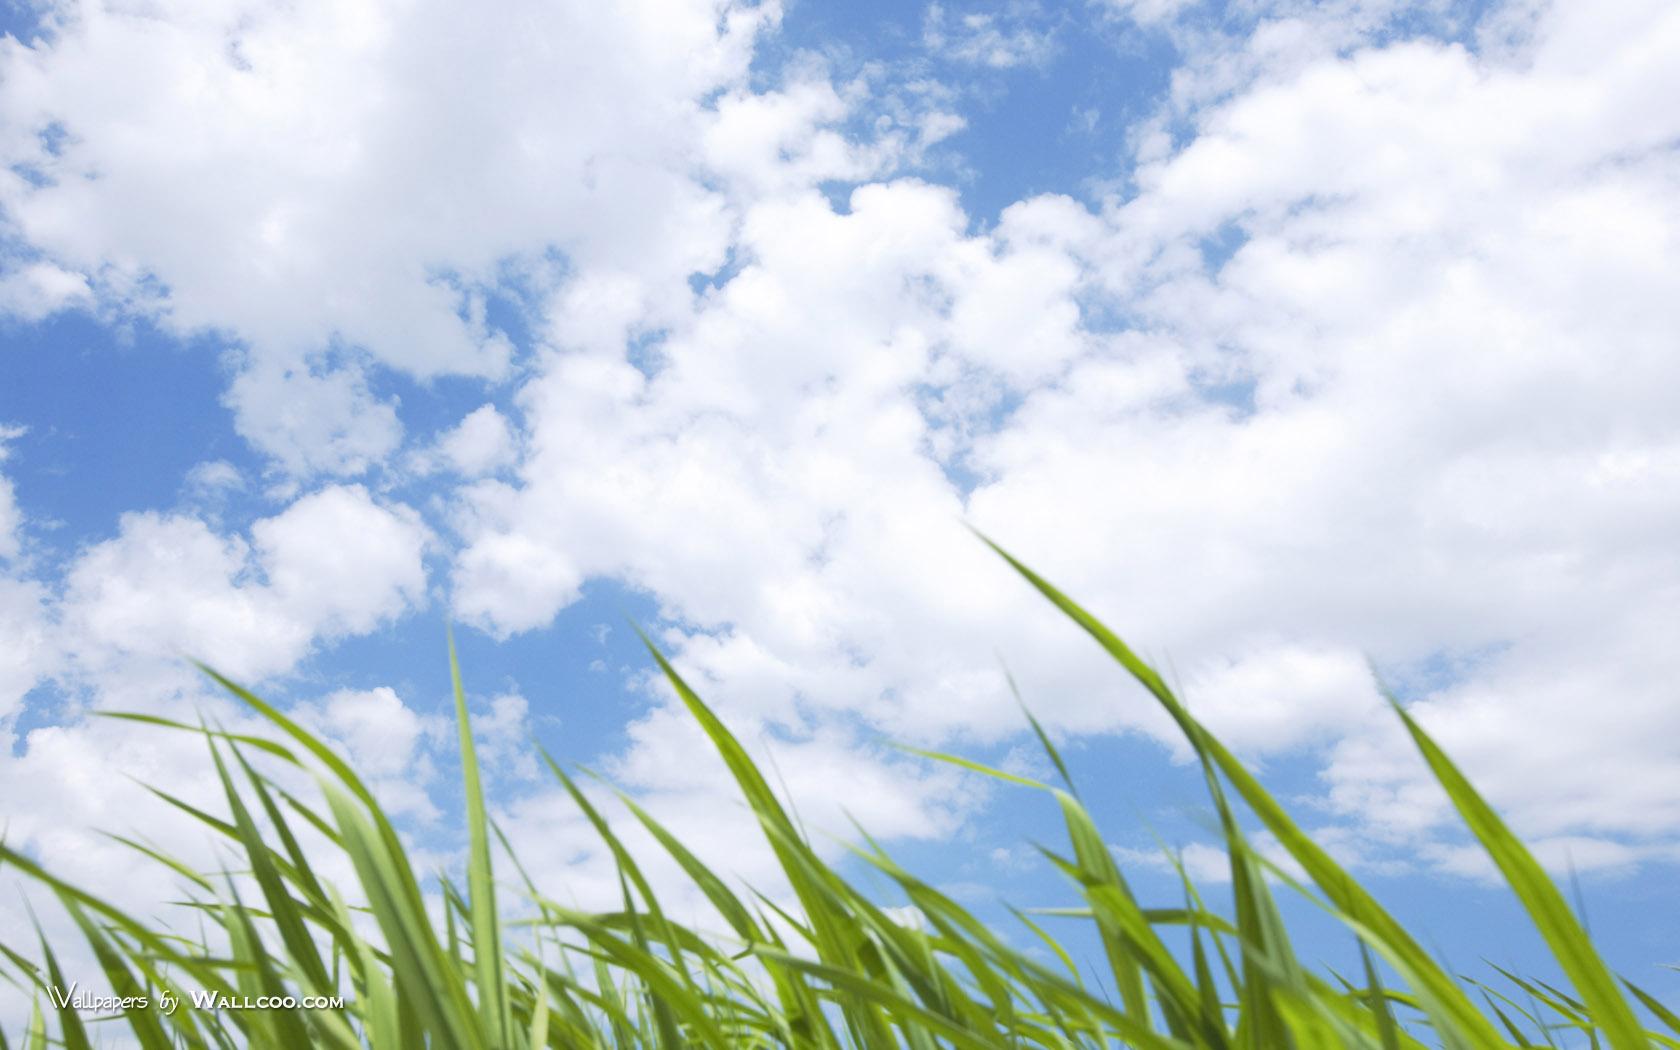 1050Green Grass Photos Grassland under blue Sky壁纸,青青草原 草原天空摄影壁纸壁纸图片